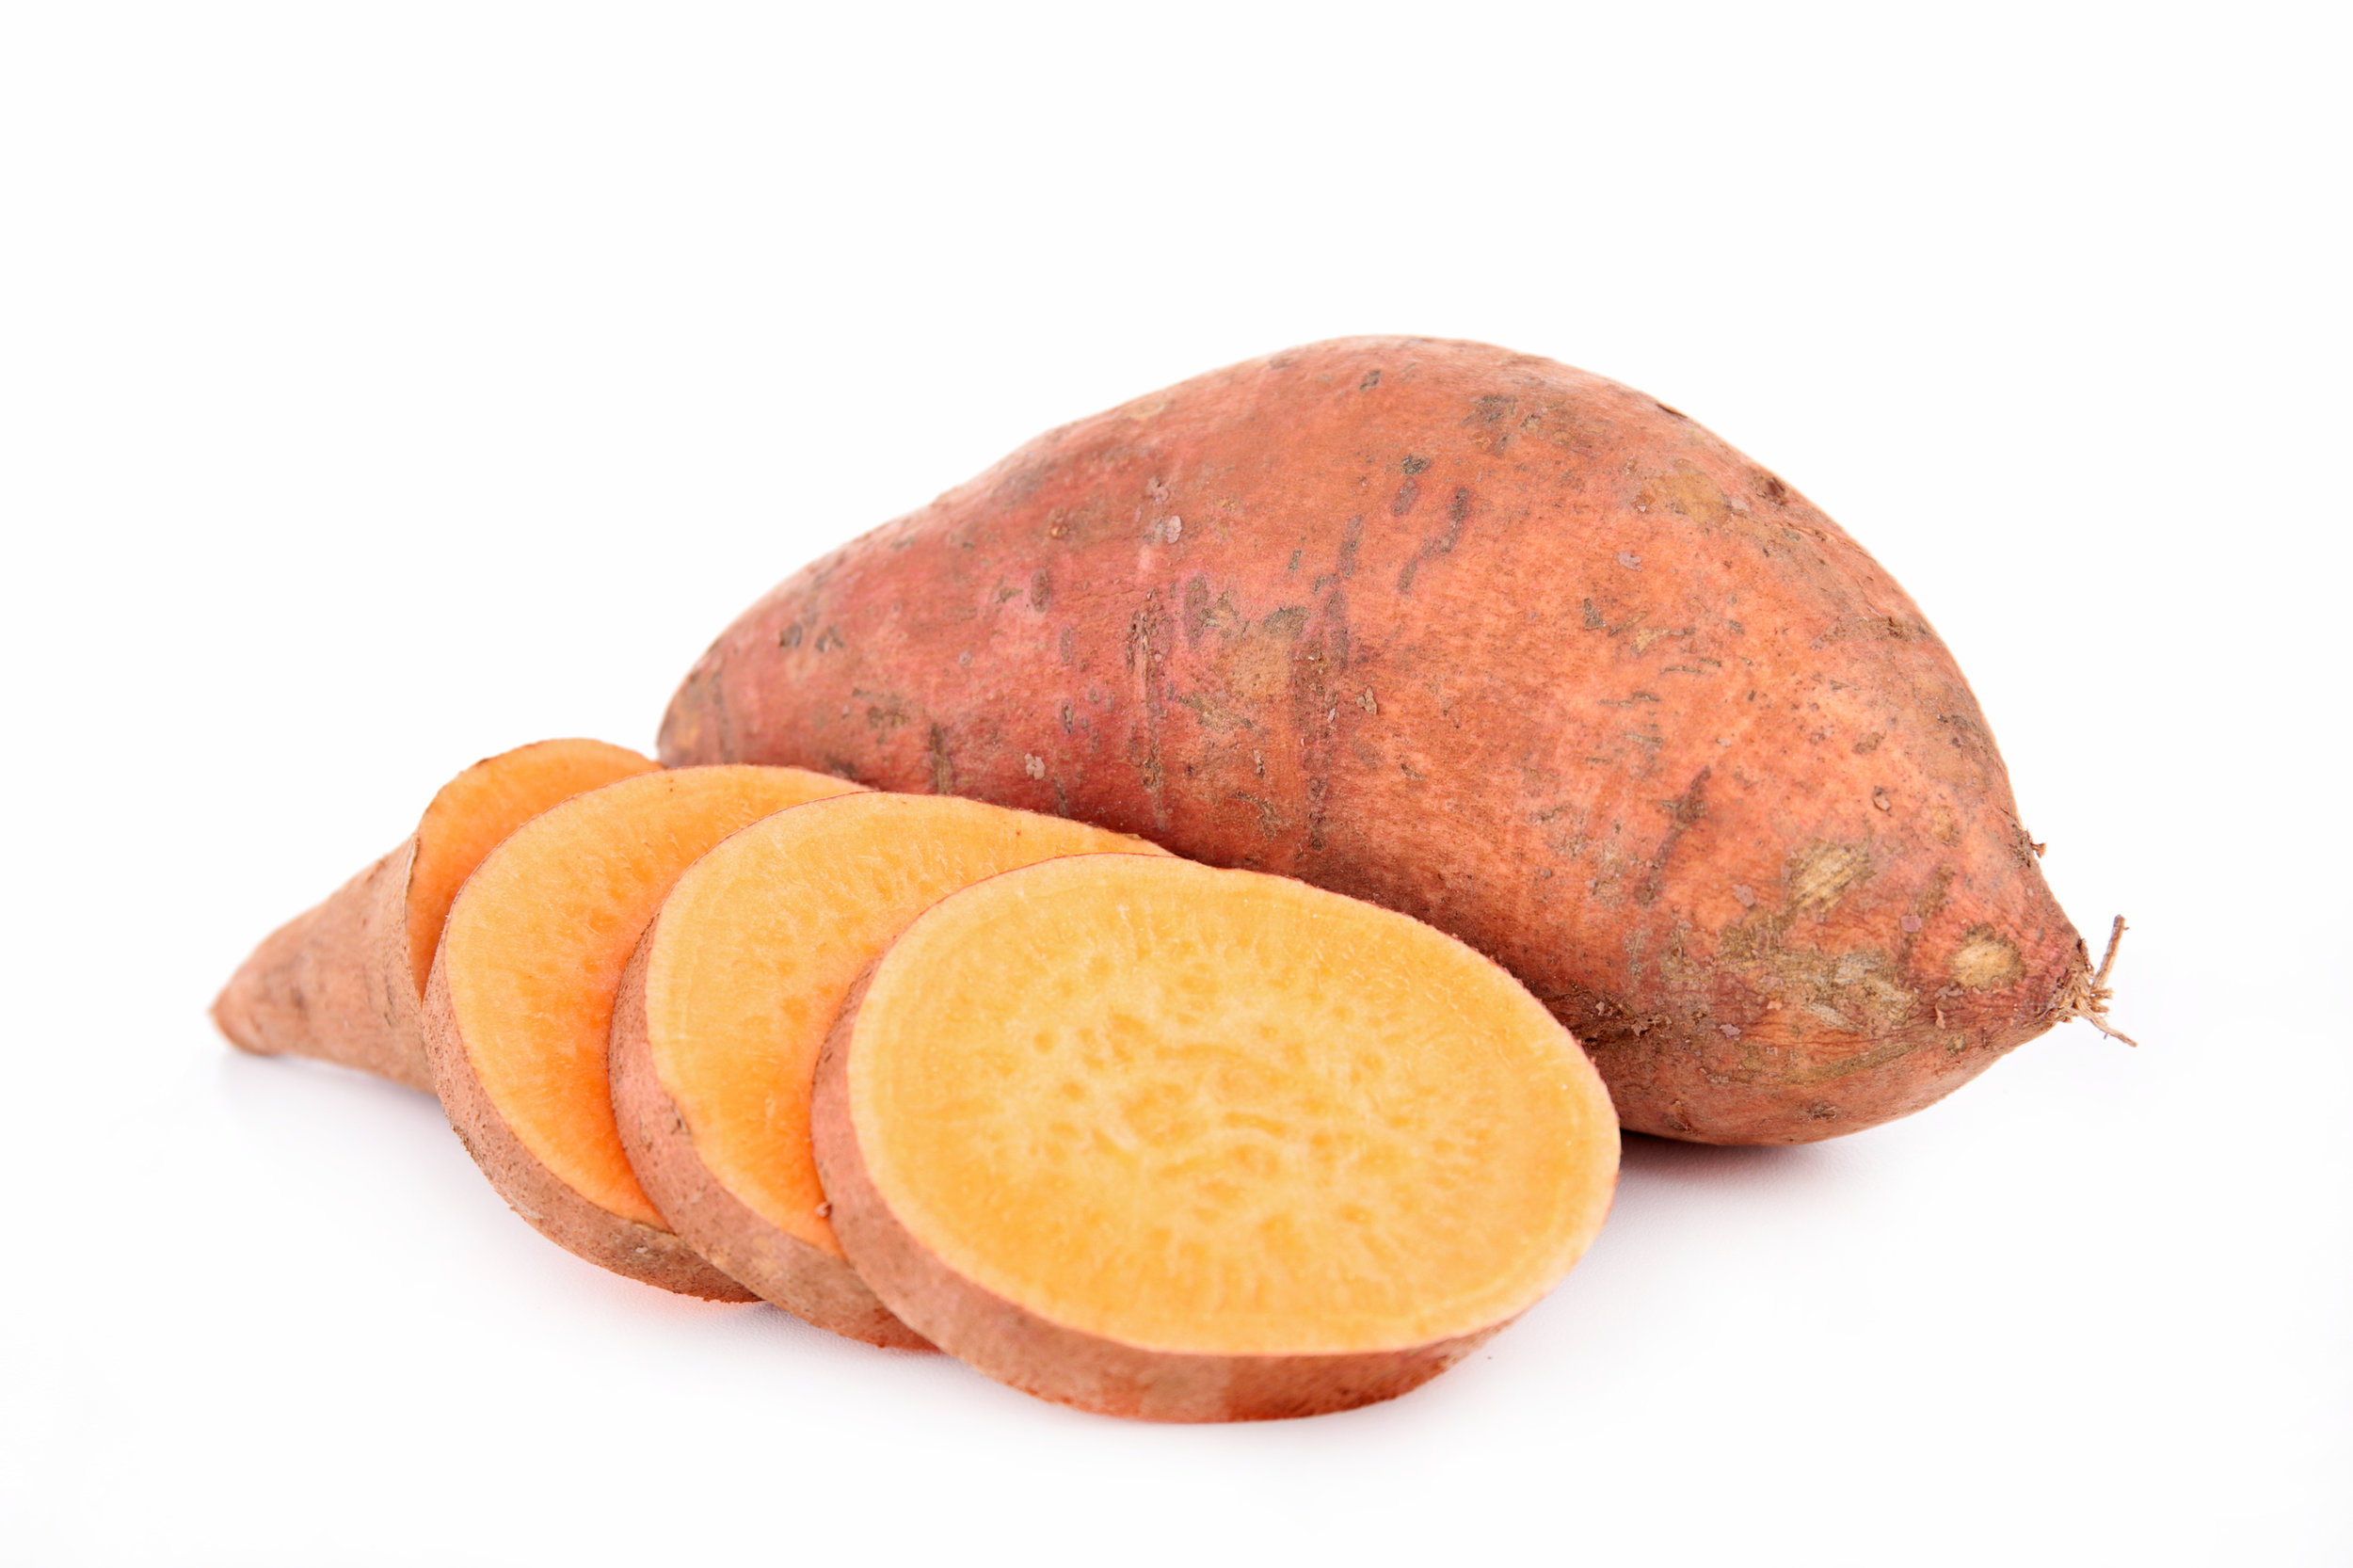 sweet-potato-38507926.jpg